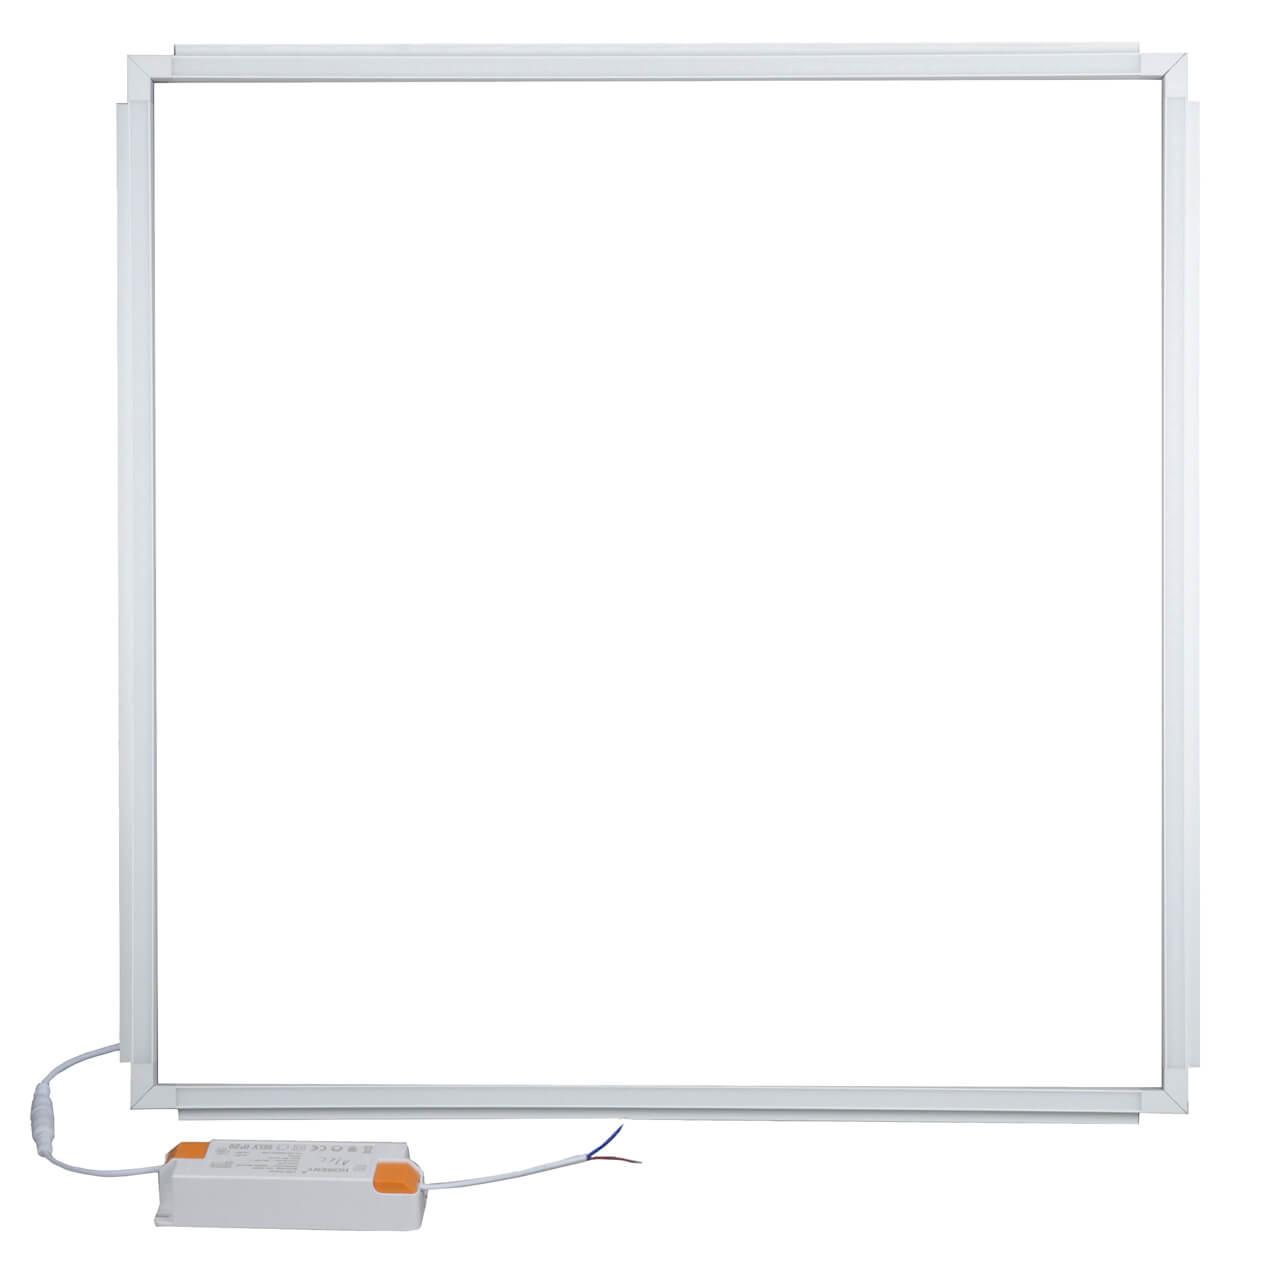 Потолочный светодиодный светильник (UL-00004632) Uniel ULO-RF6060-38W/4000K Reframe white uniel ulo zl ulozl9050wnw